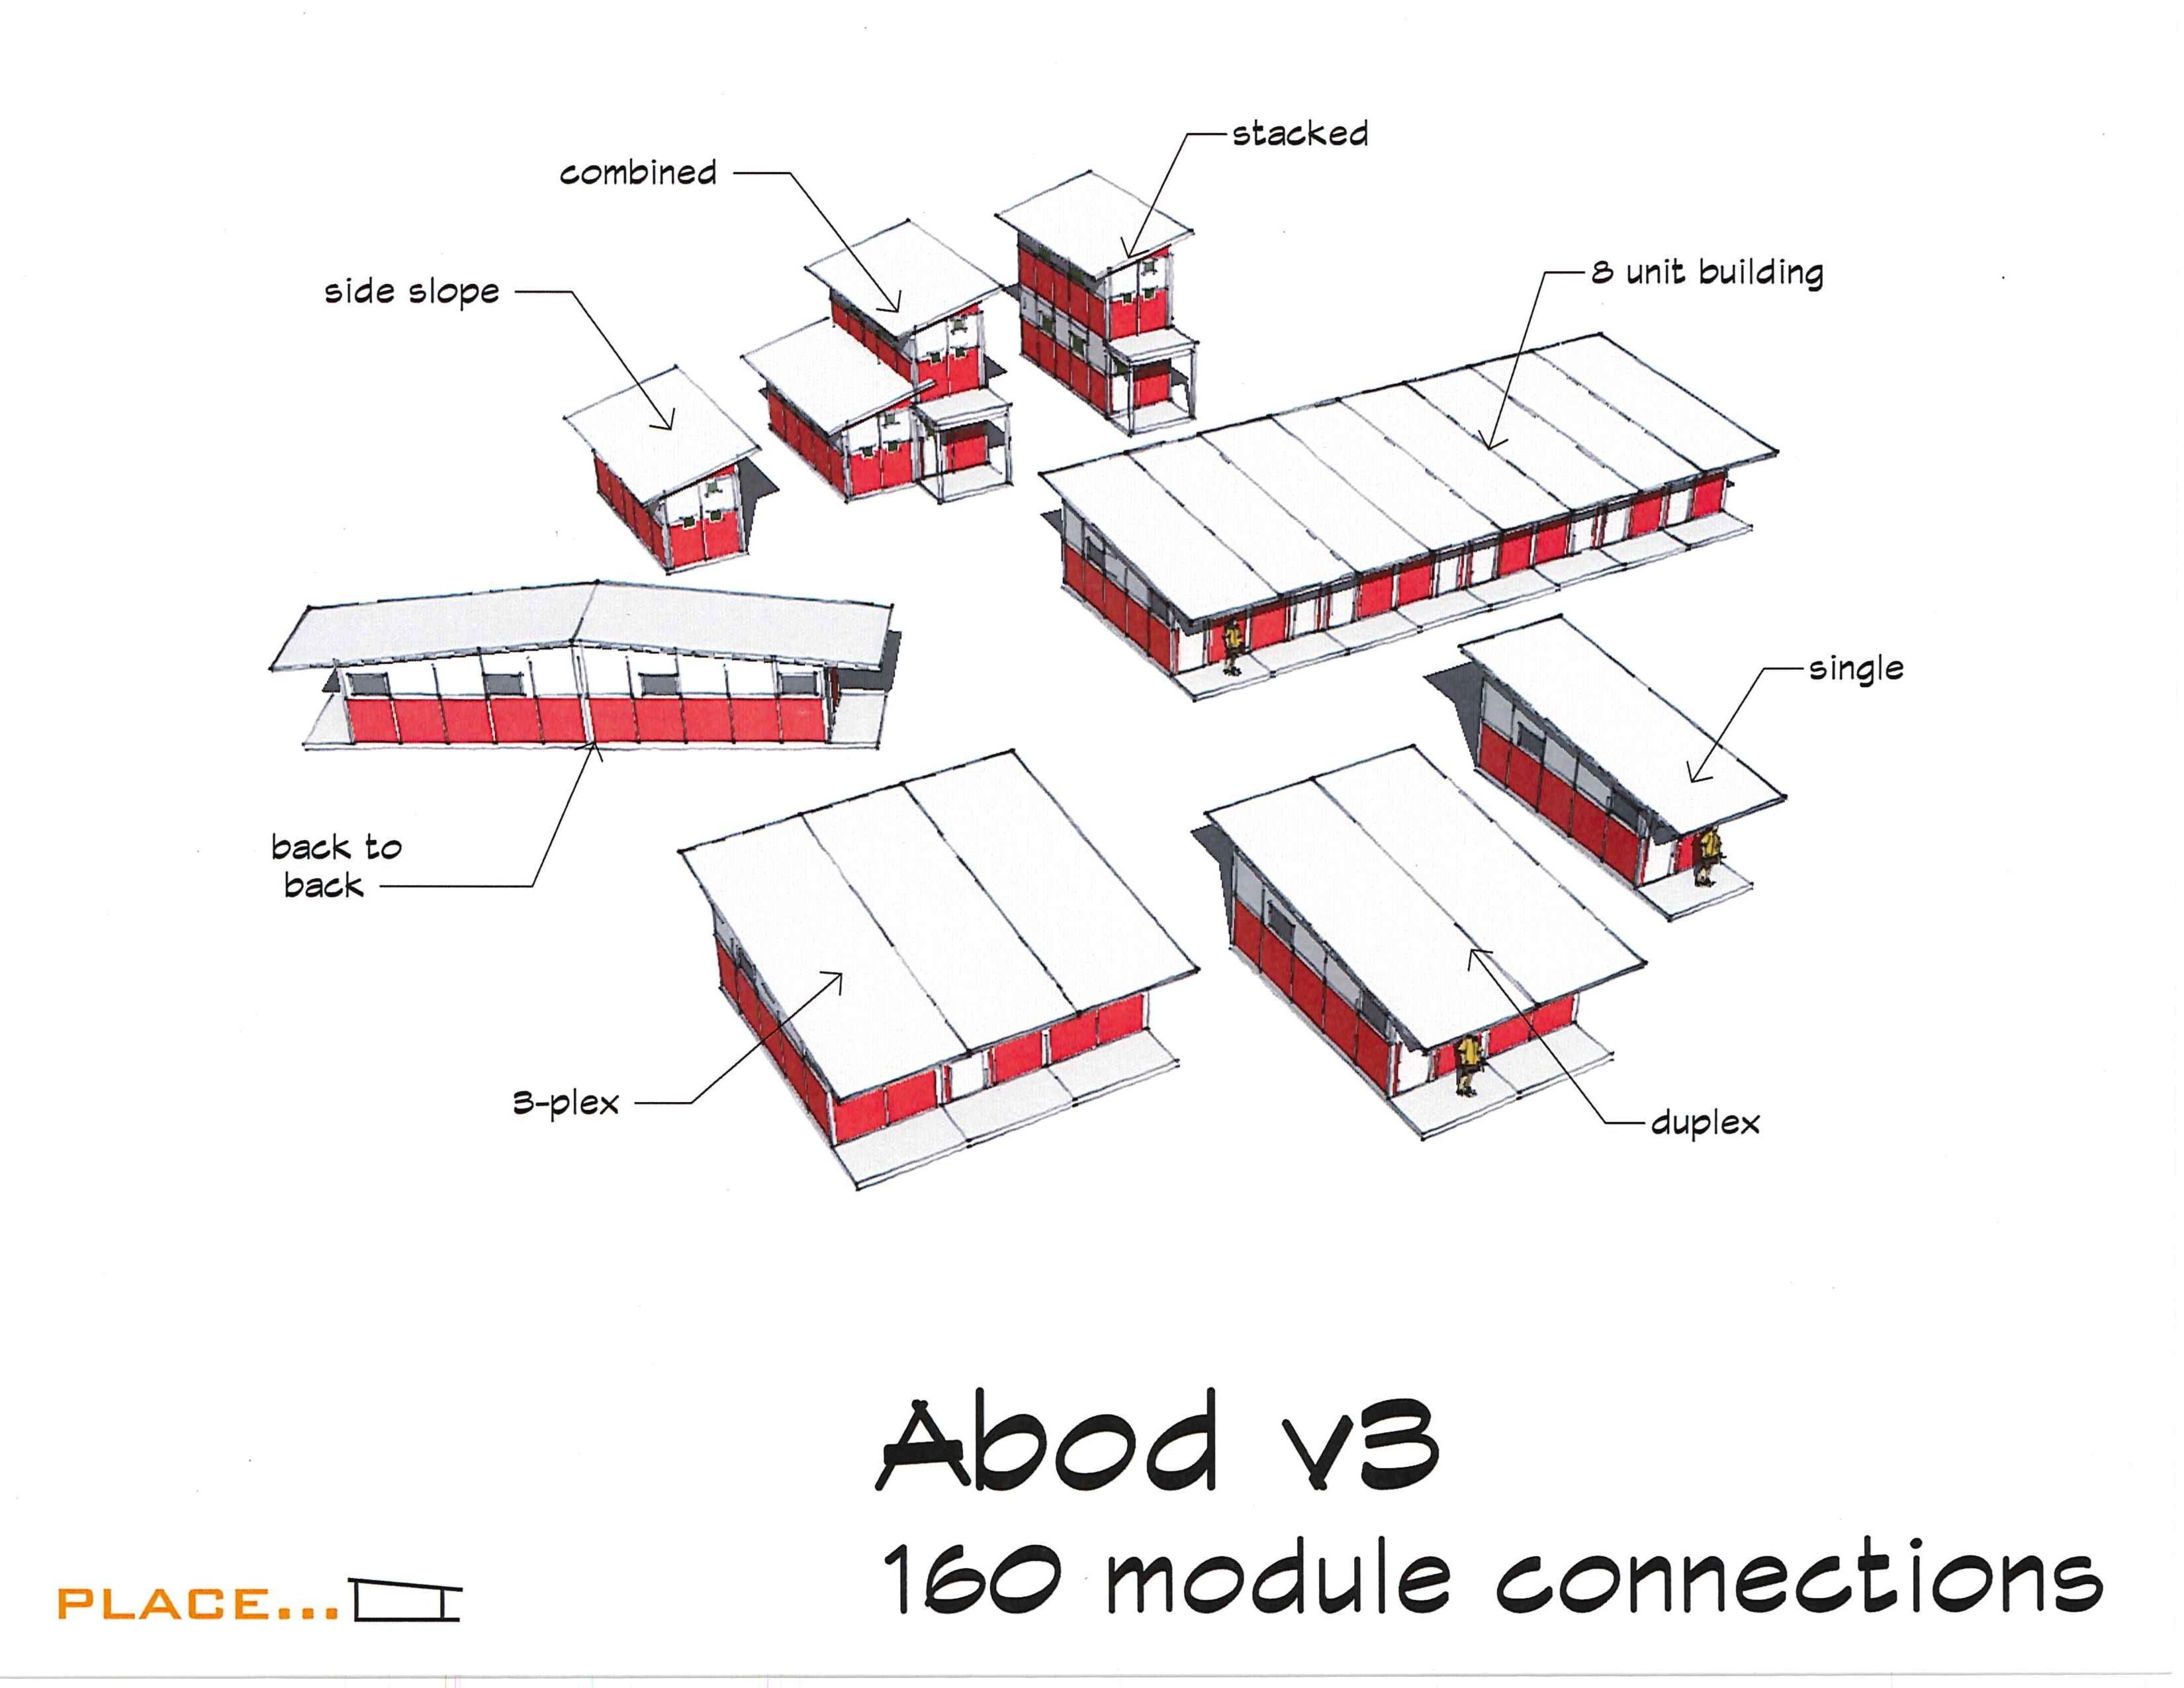 Building the Case for Smarter, Affordable Housing | Builder Magazine